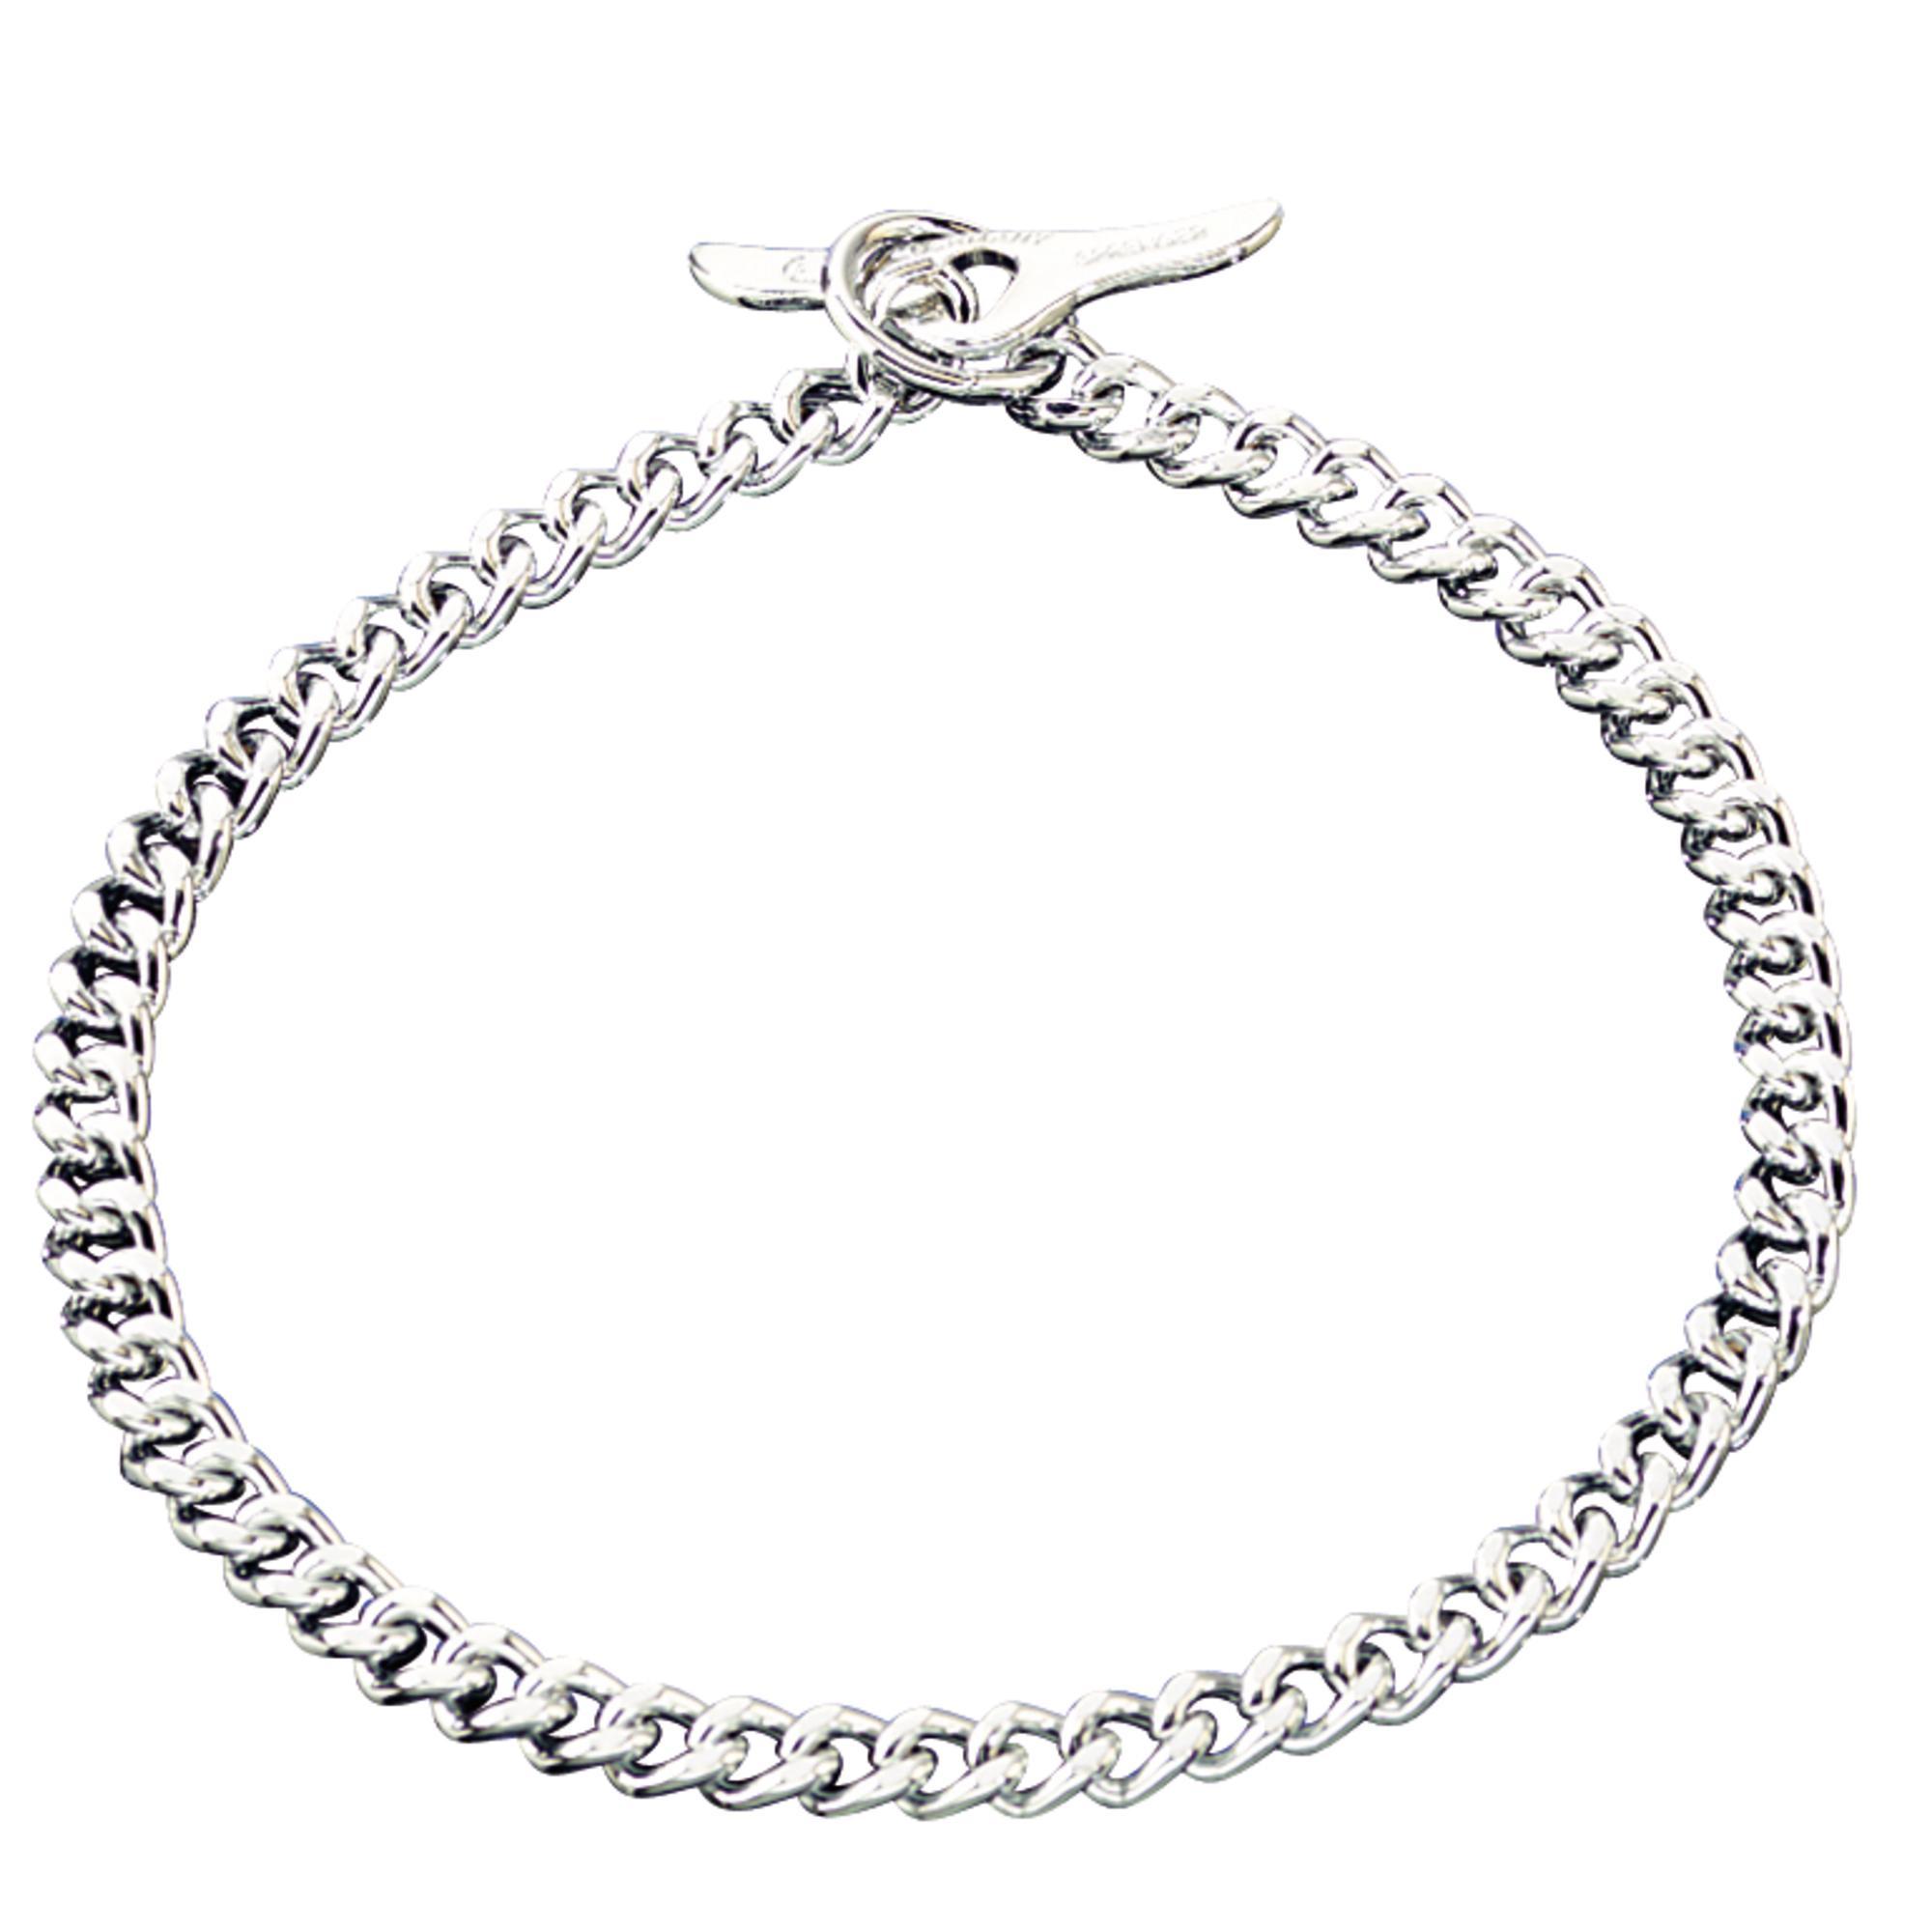 Collar With Toggle Closure Flat Polished Narrow Links